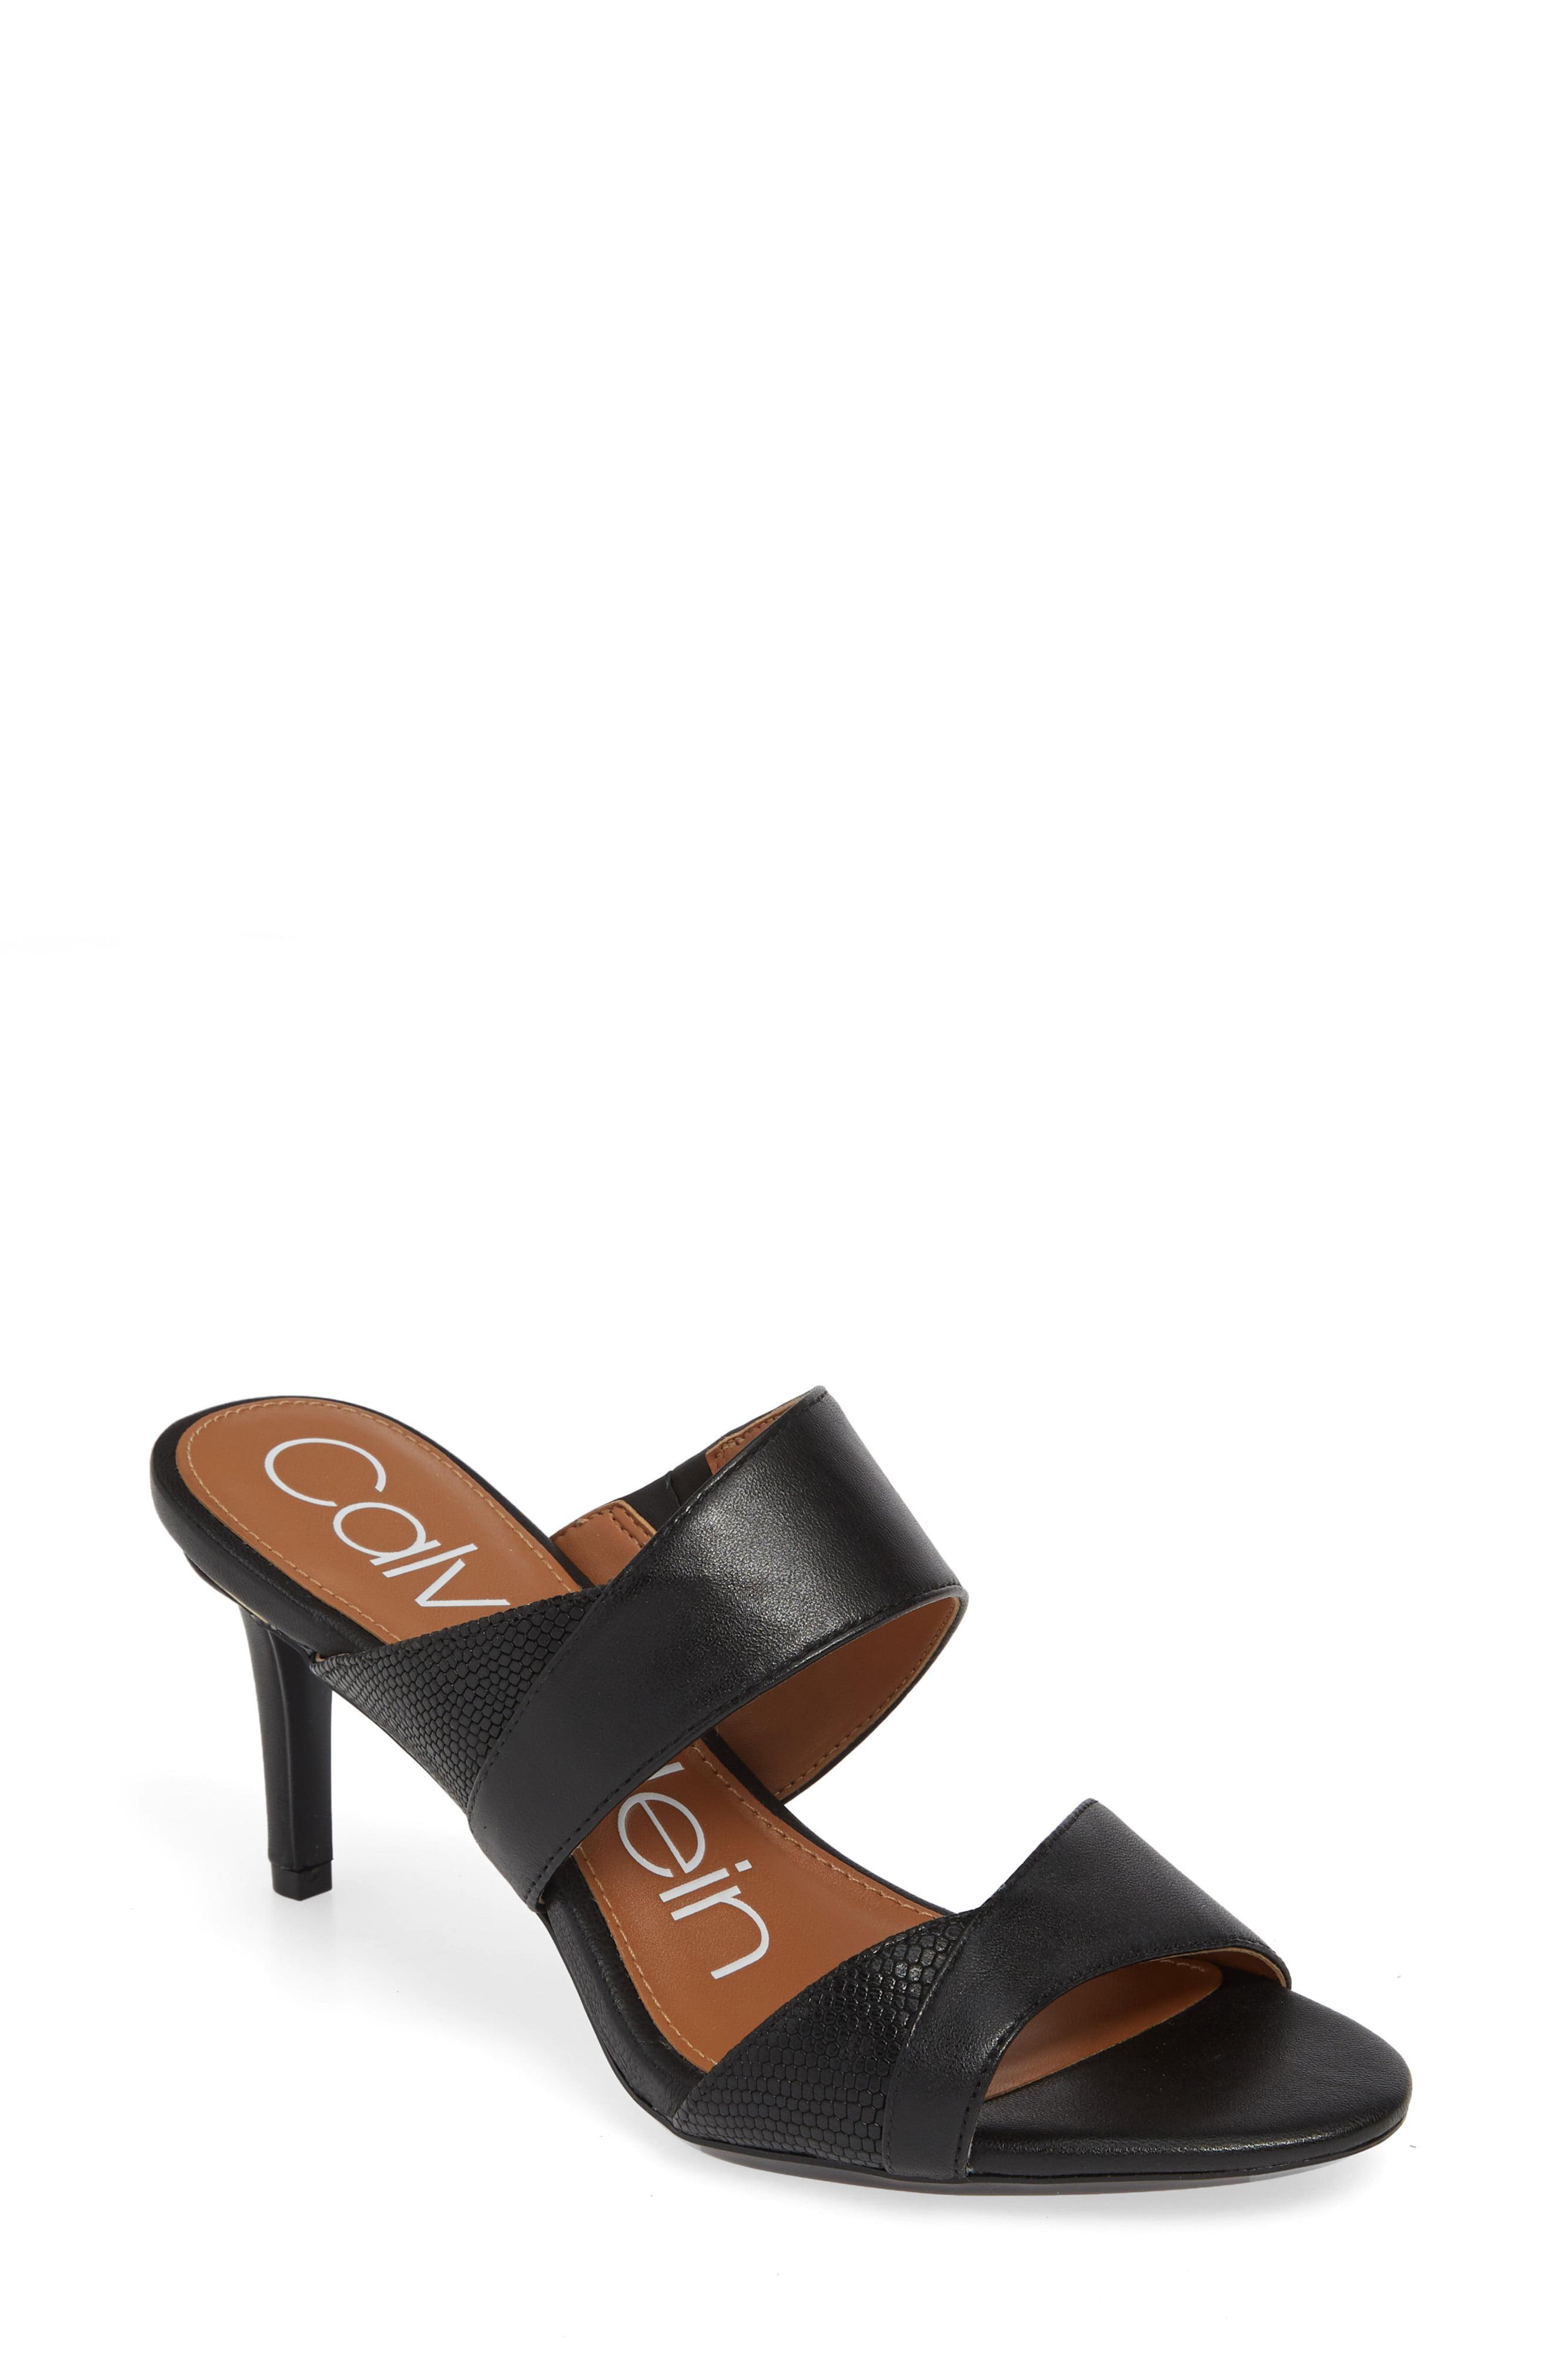 Calvin Lyst Lynnae Textured Black Sandal Slide In Klein vmN80yPwnO